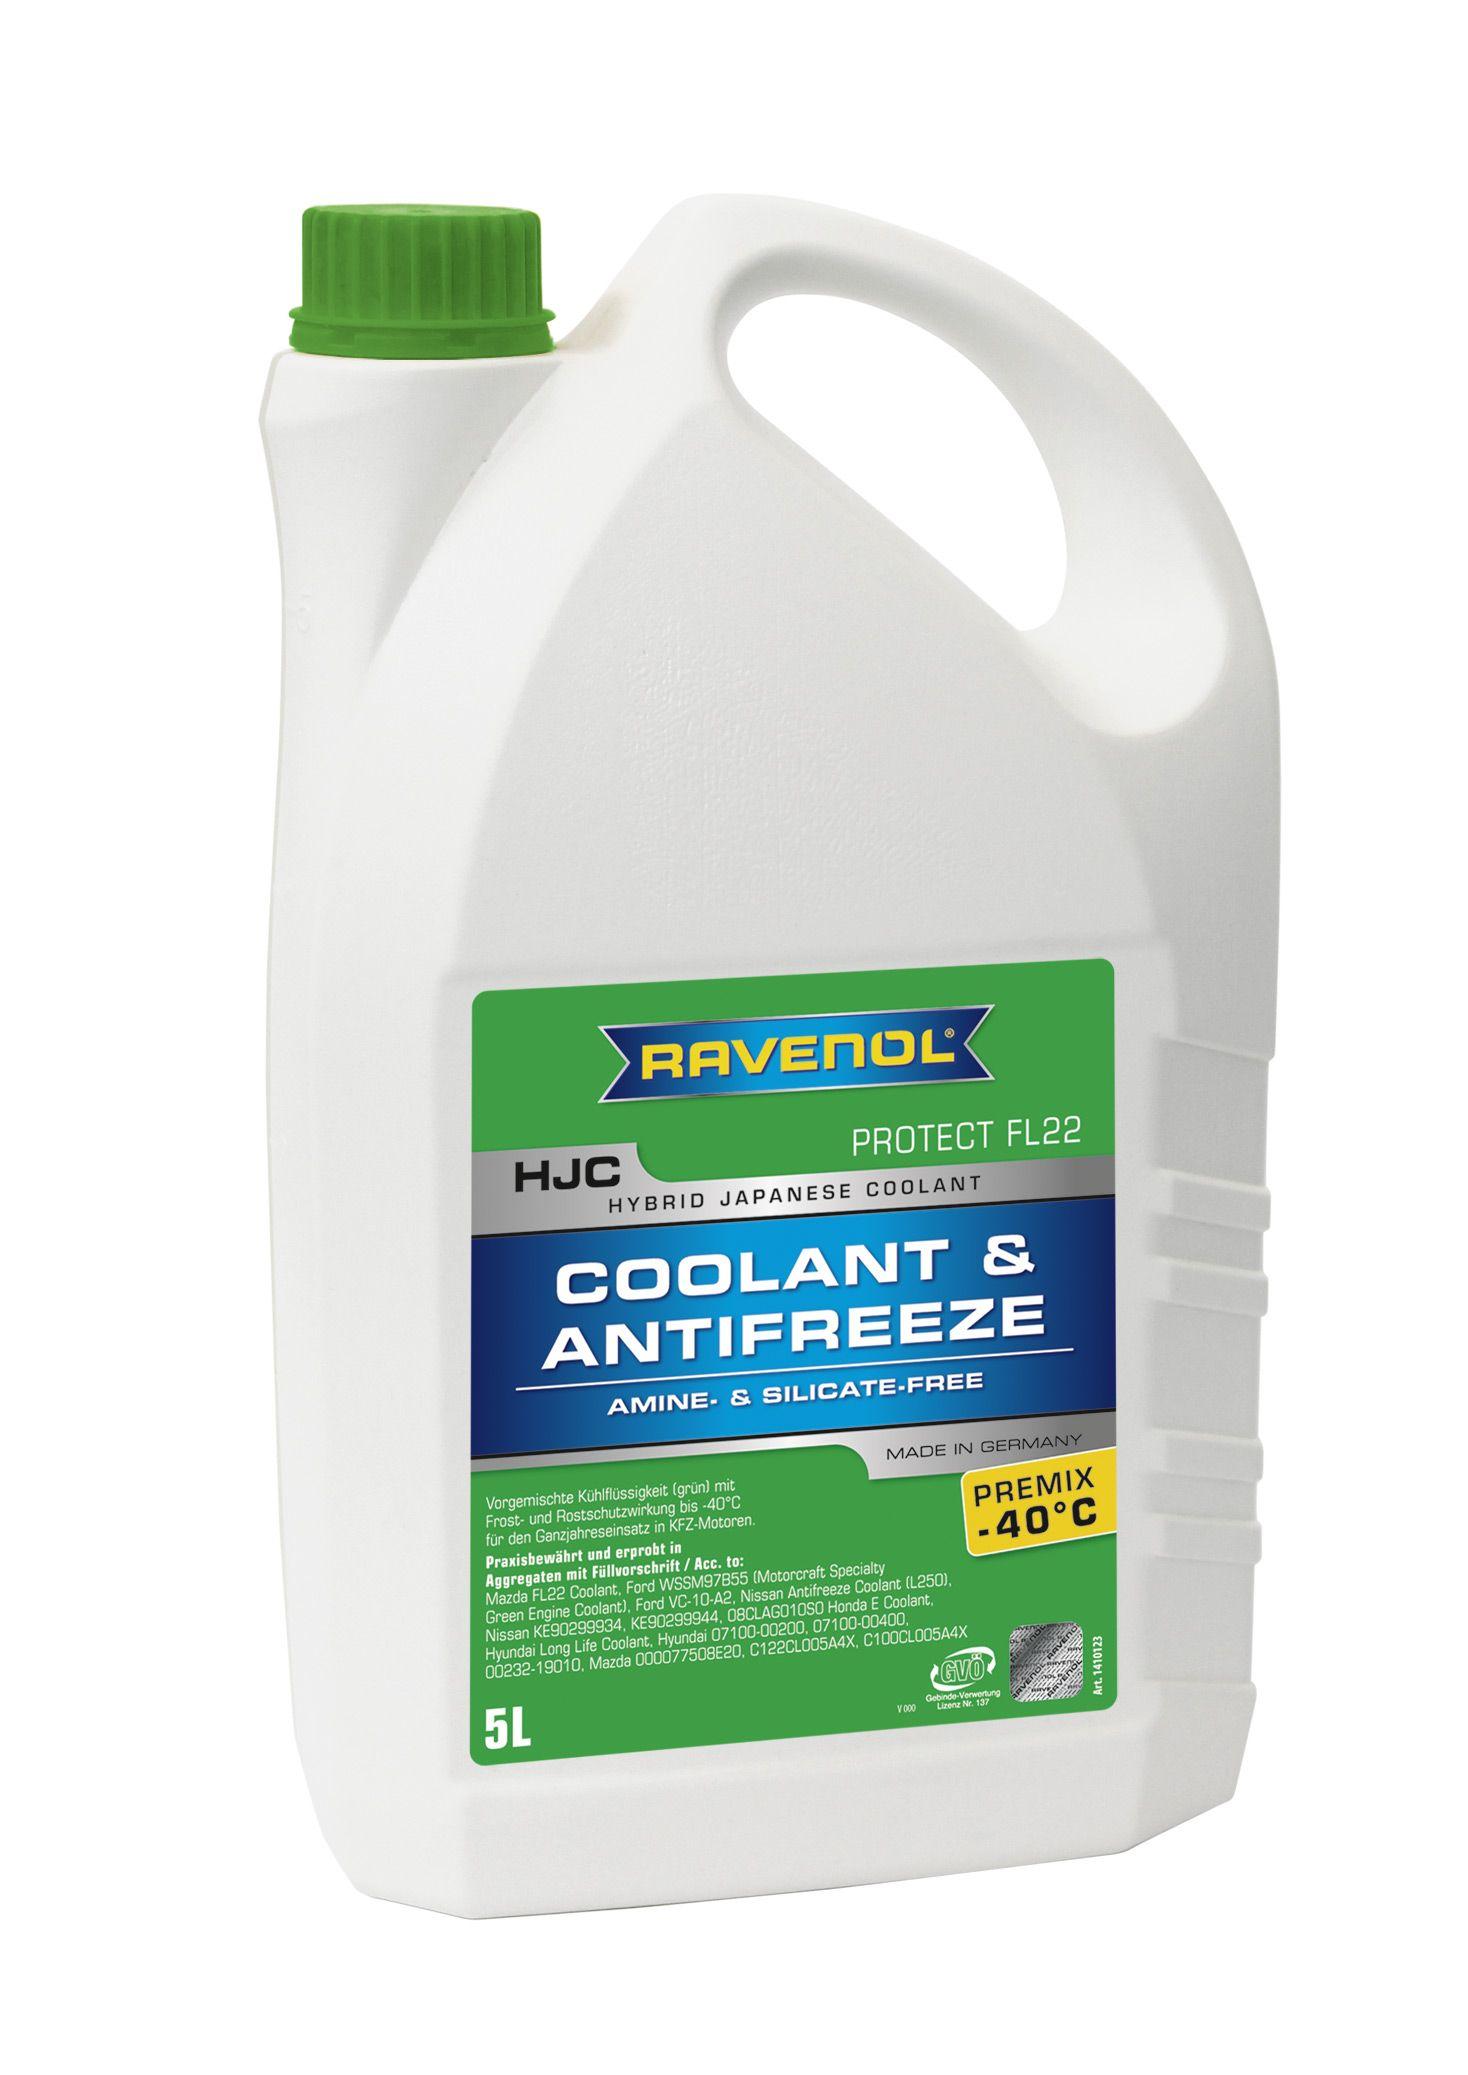 Антифриз Ravenol зеленый HJC Hybrid Japanese Coolant Premix -40°C (5 л) от Ravta